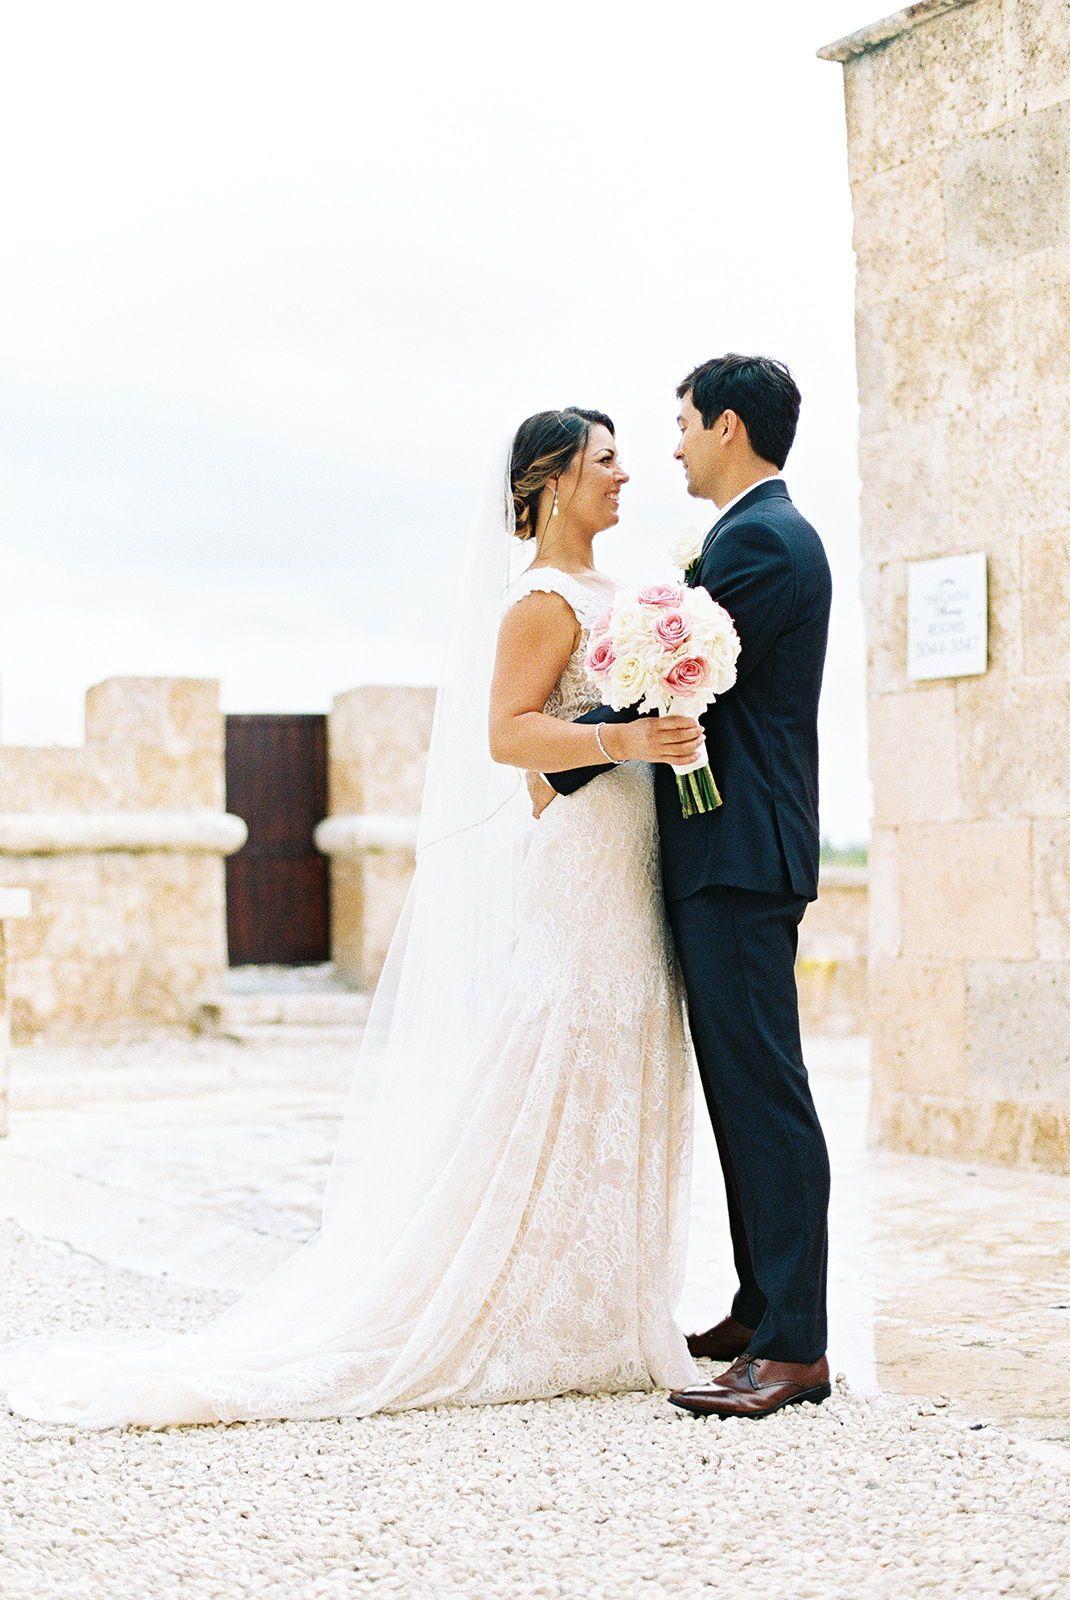 A Dreamy Seaside Destination Wedding at the Sanctuary Cap